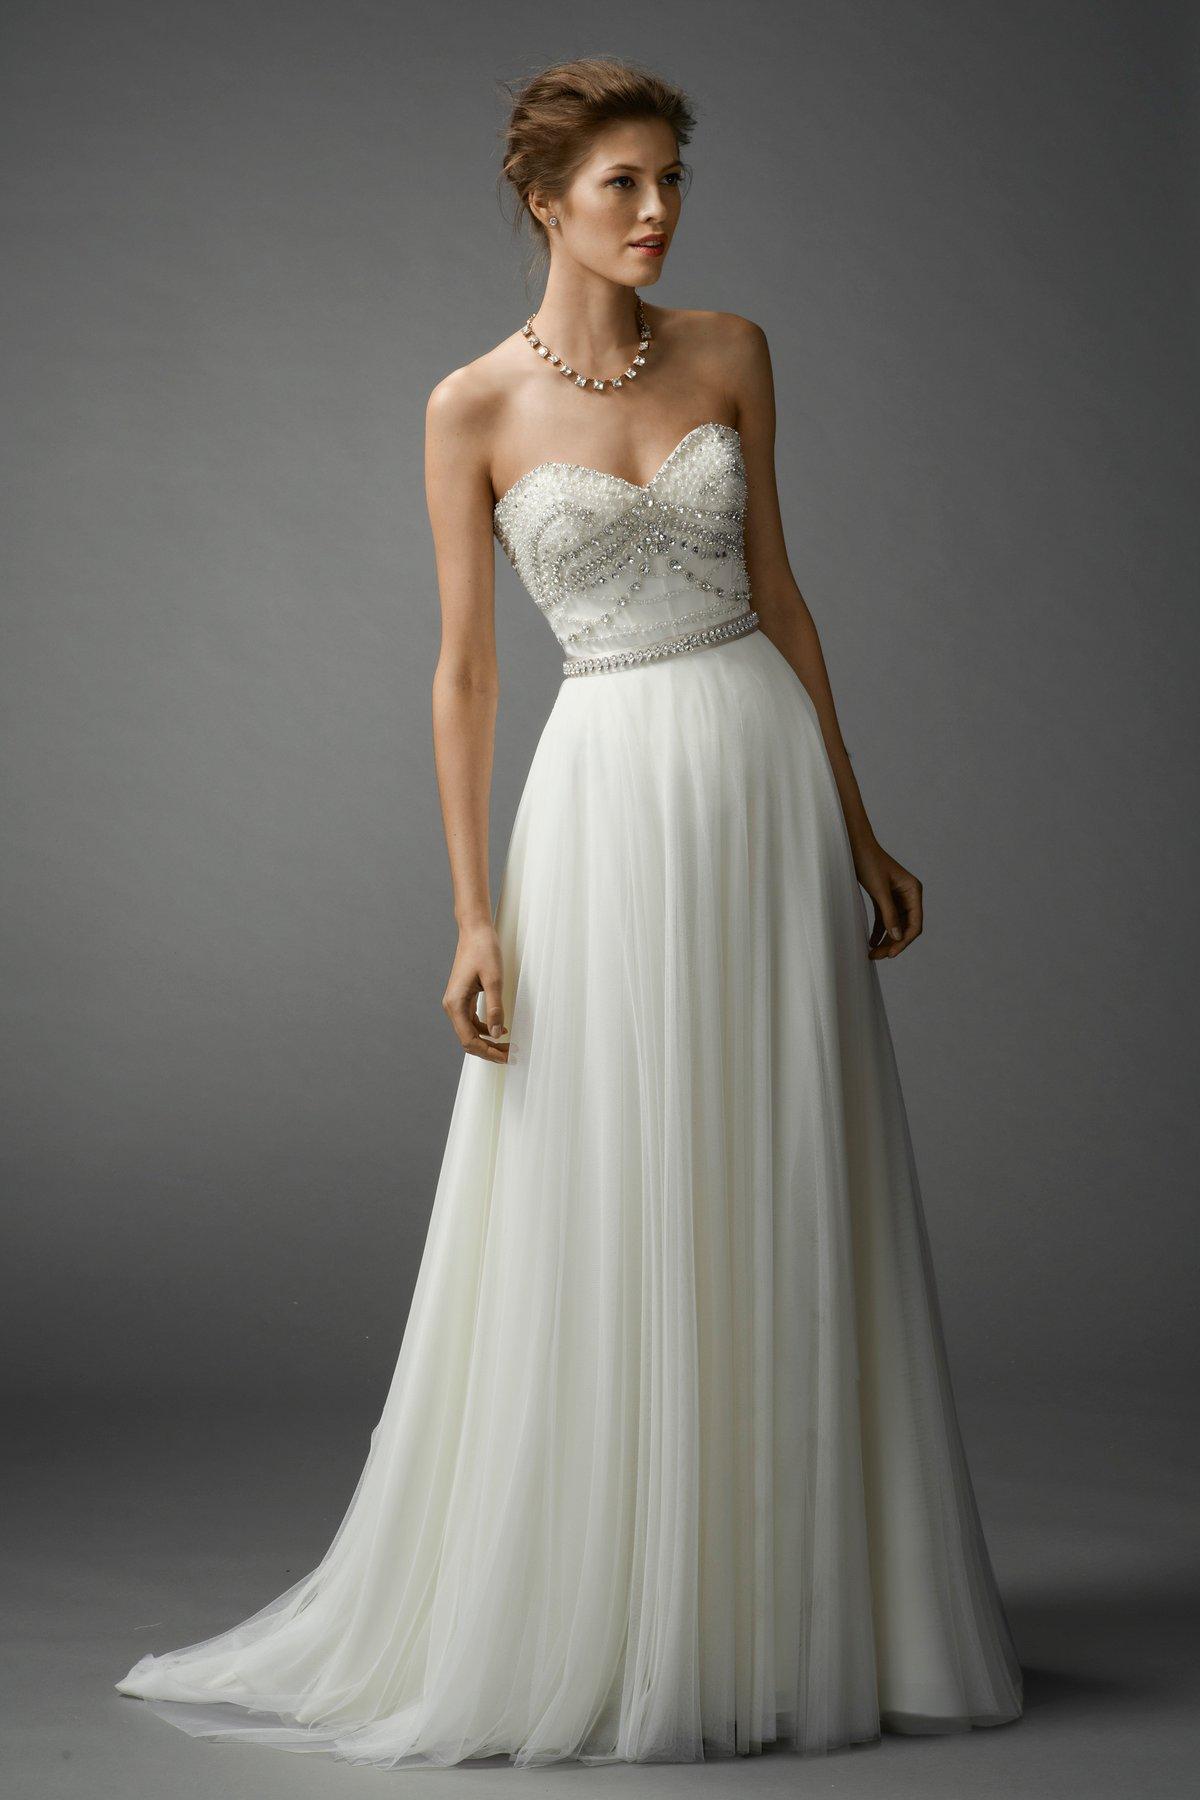 detachable skirt to go with wedding dress wedding dress skirt Detachable skirt to go with wedding dress